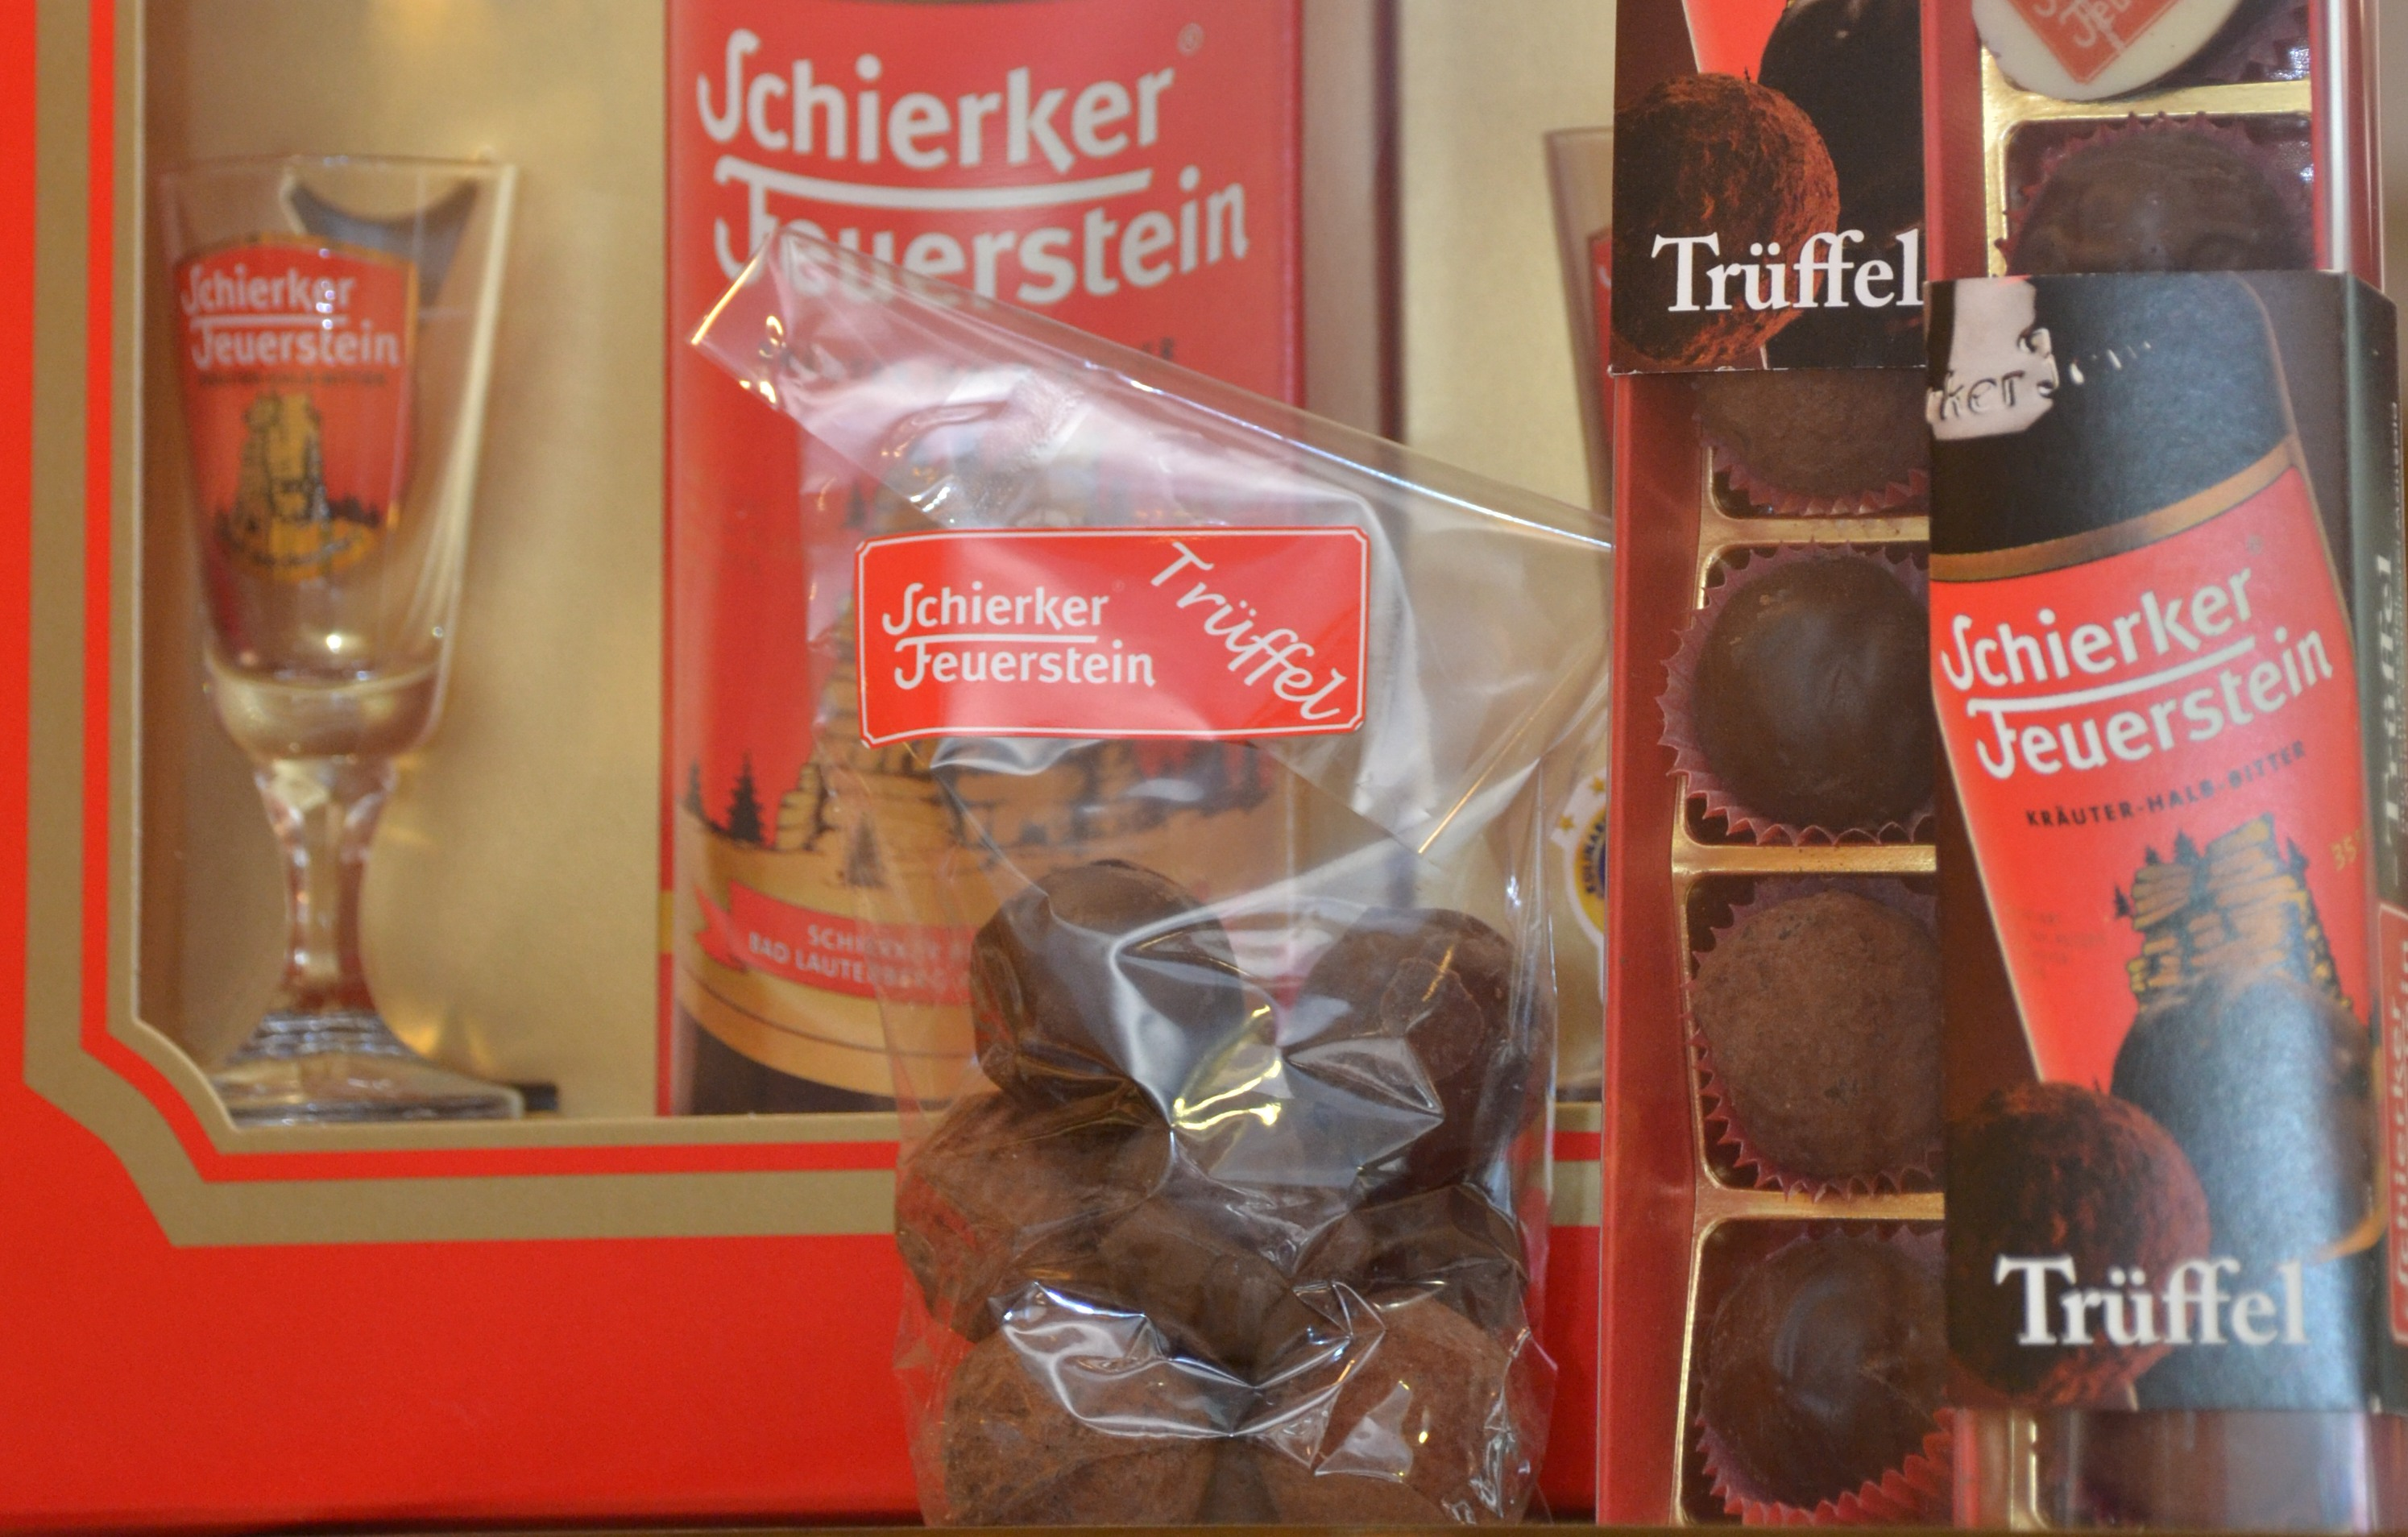 2-Meister-Conditorei Mangold - Schierker & Trüffel